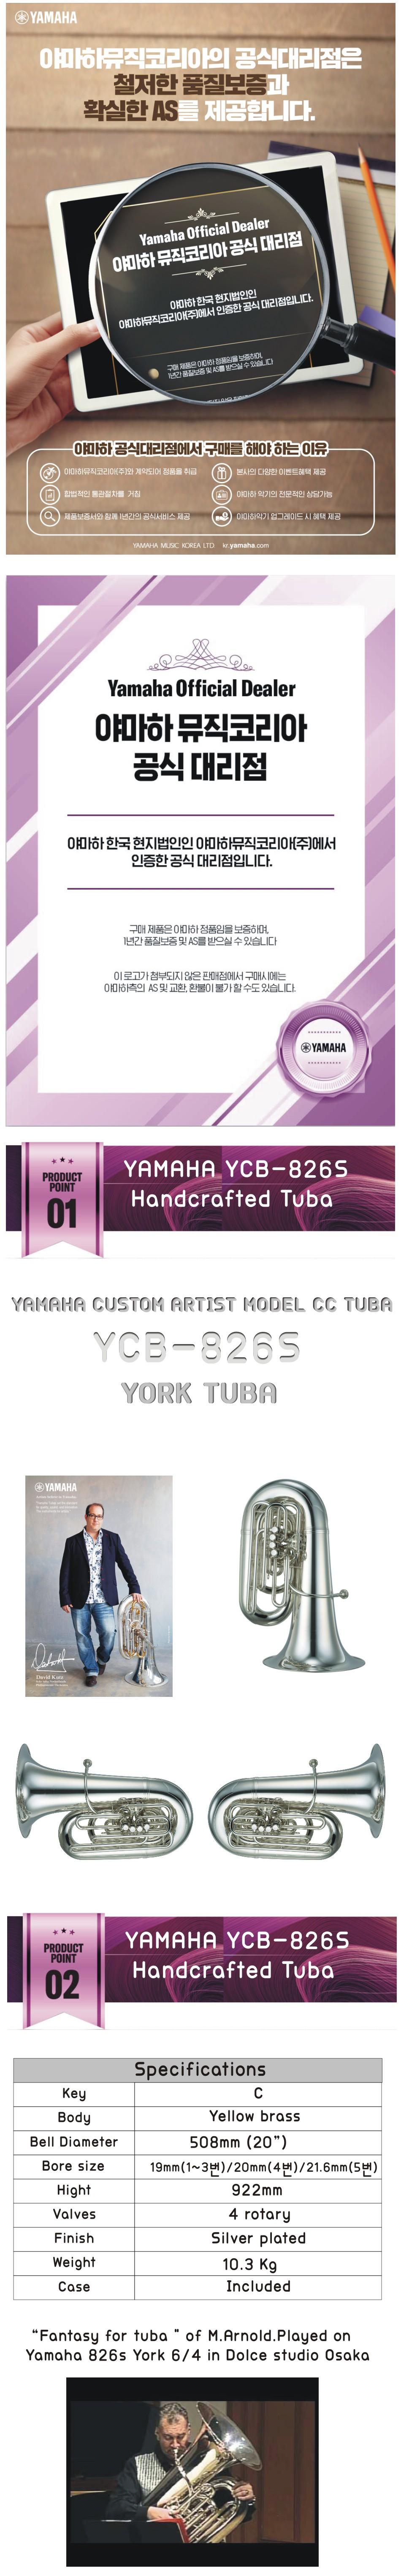 YCB826S-1.JPG